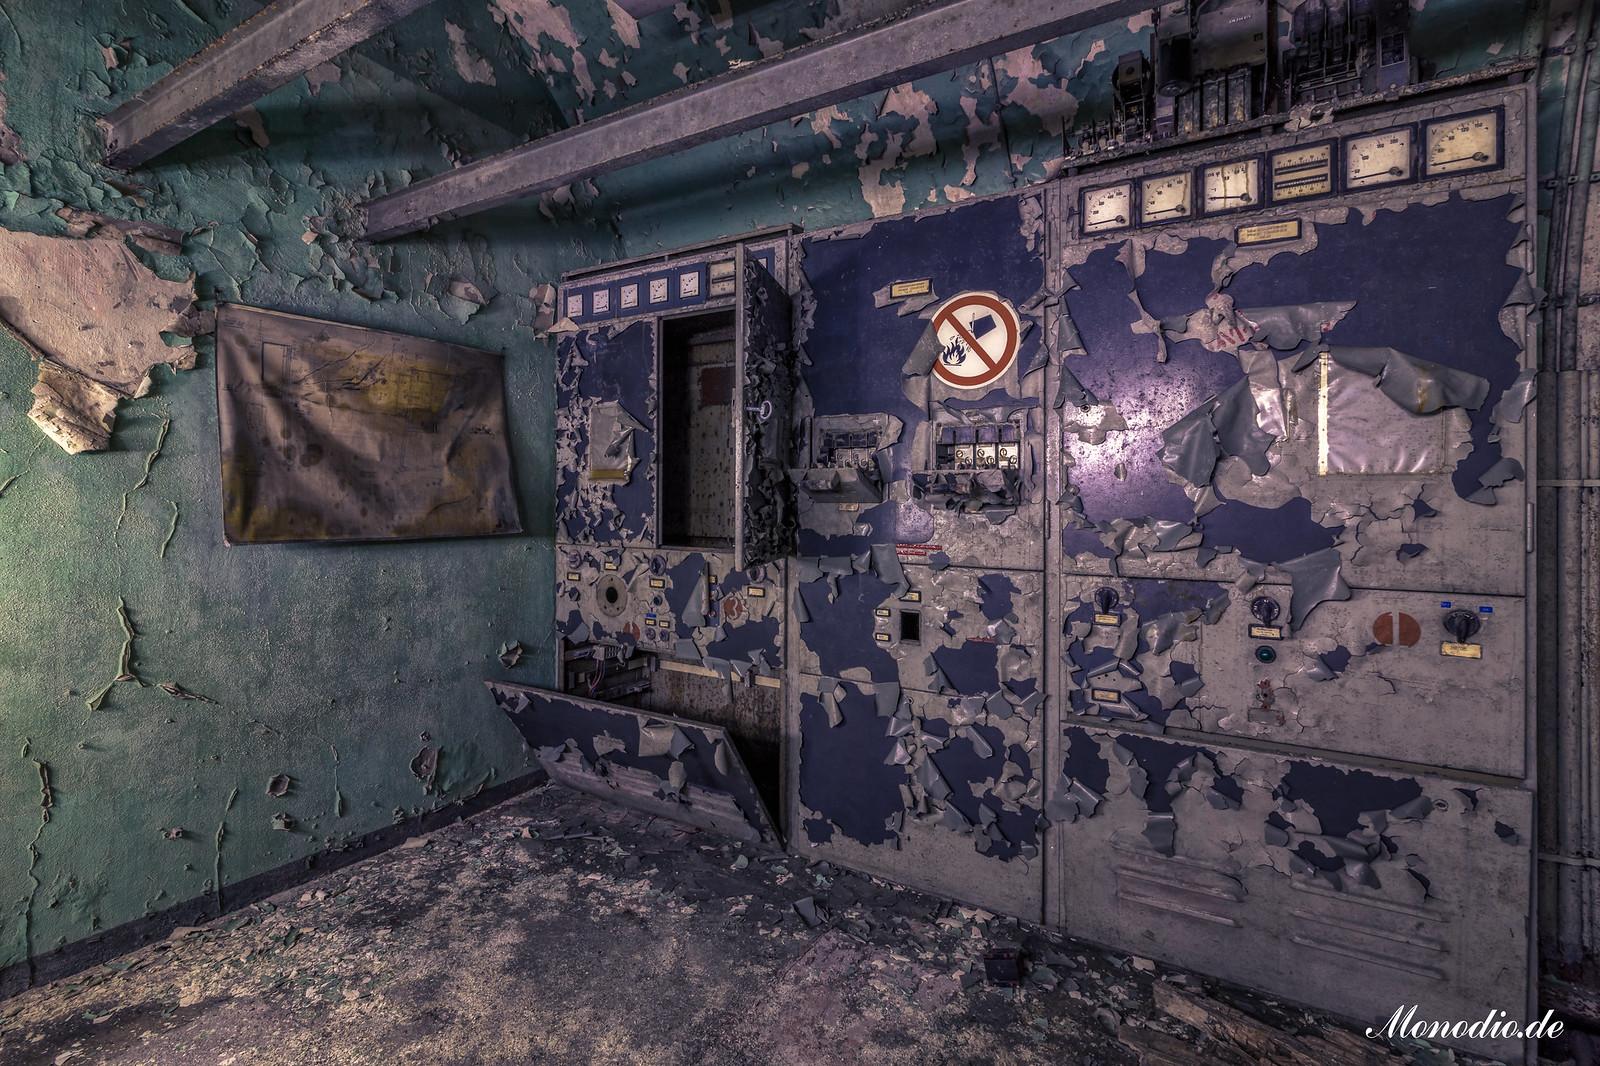 NATO Bunker K